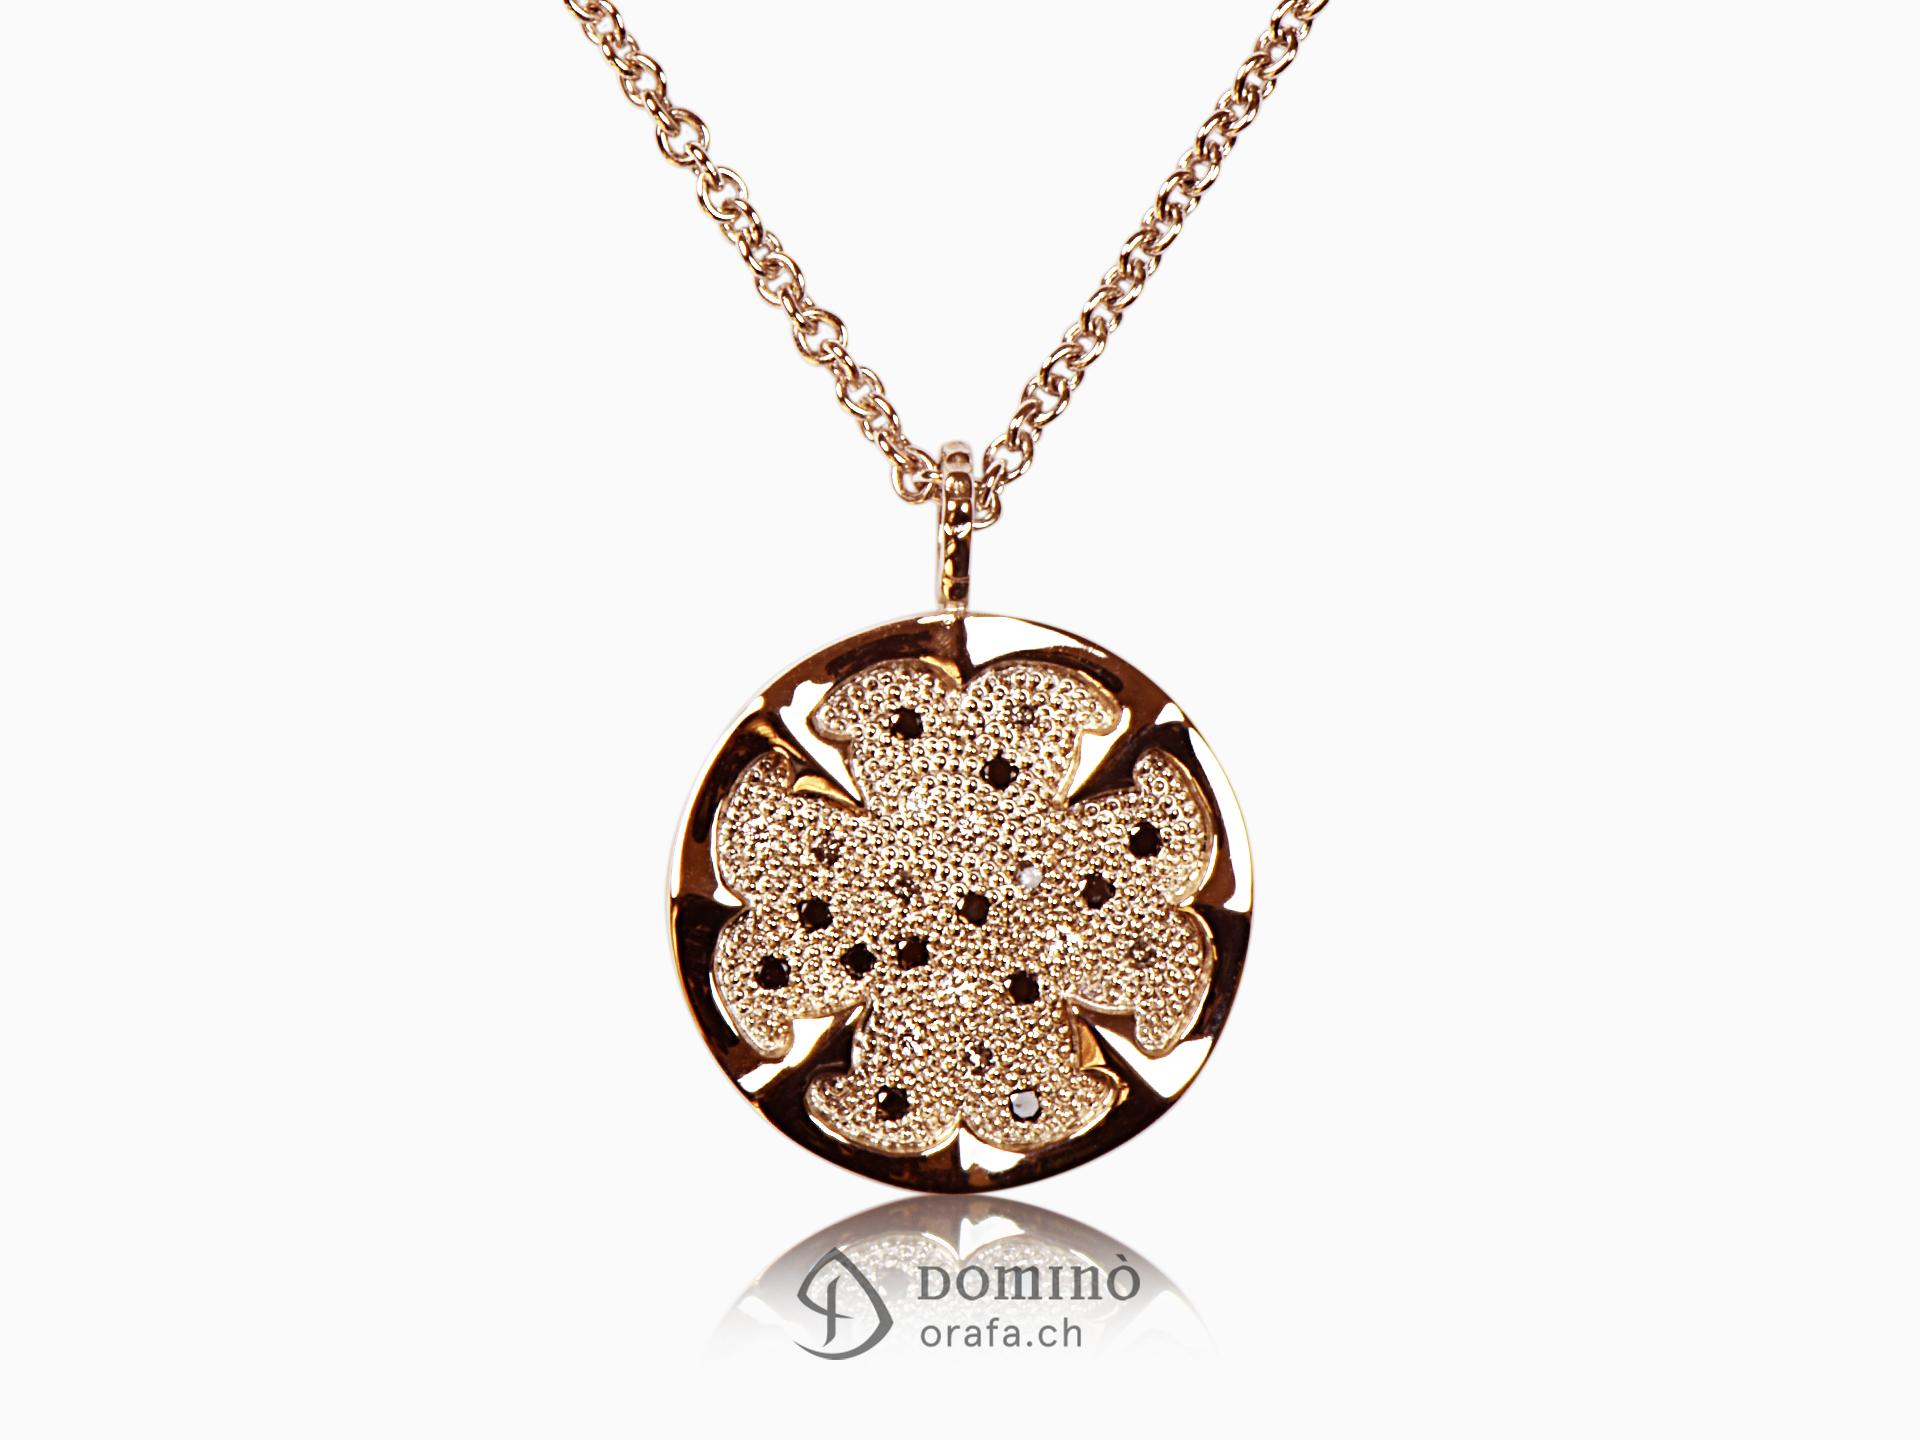 Four-leaf clover with diamonds